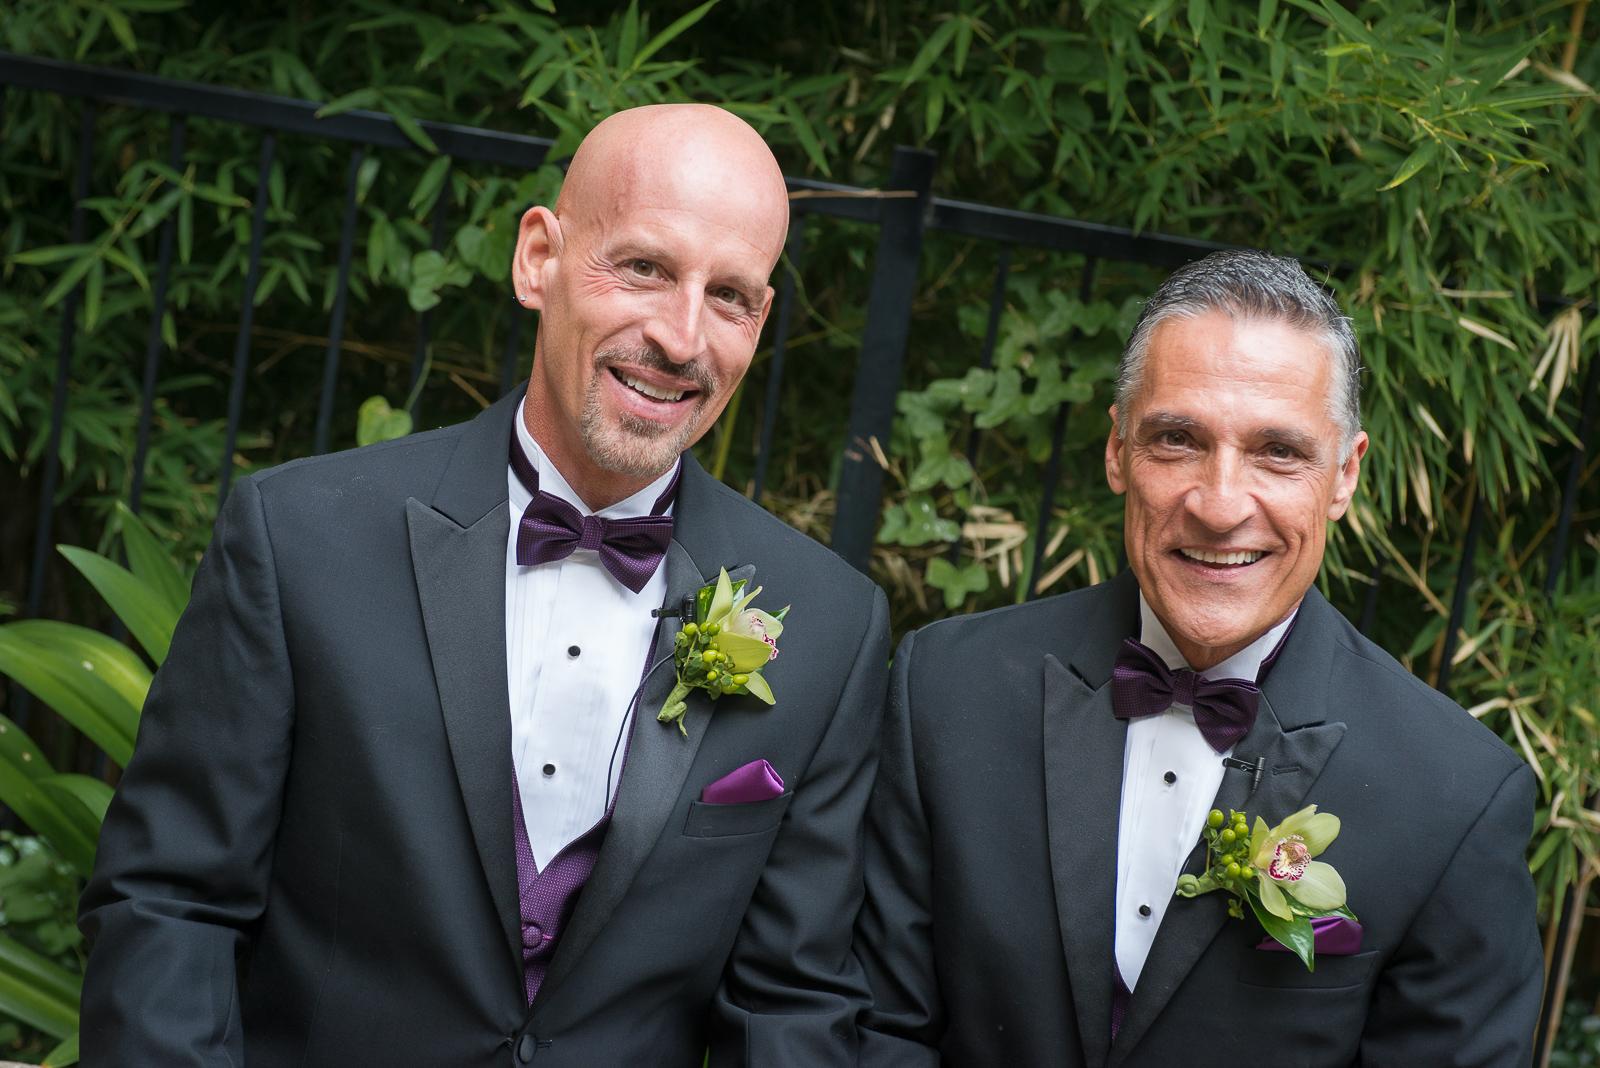 Michael-Napier-Weddings-Ludwig-Guilbeau Wedding-20 (10).jpg